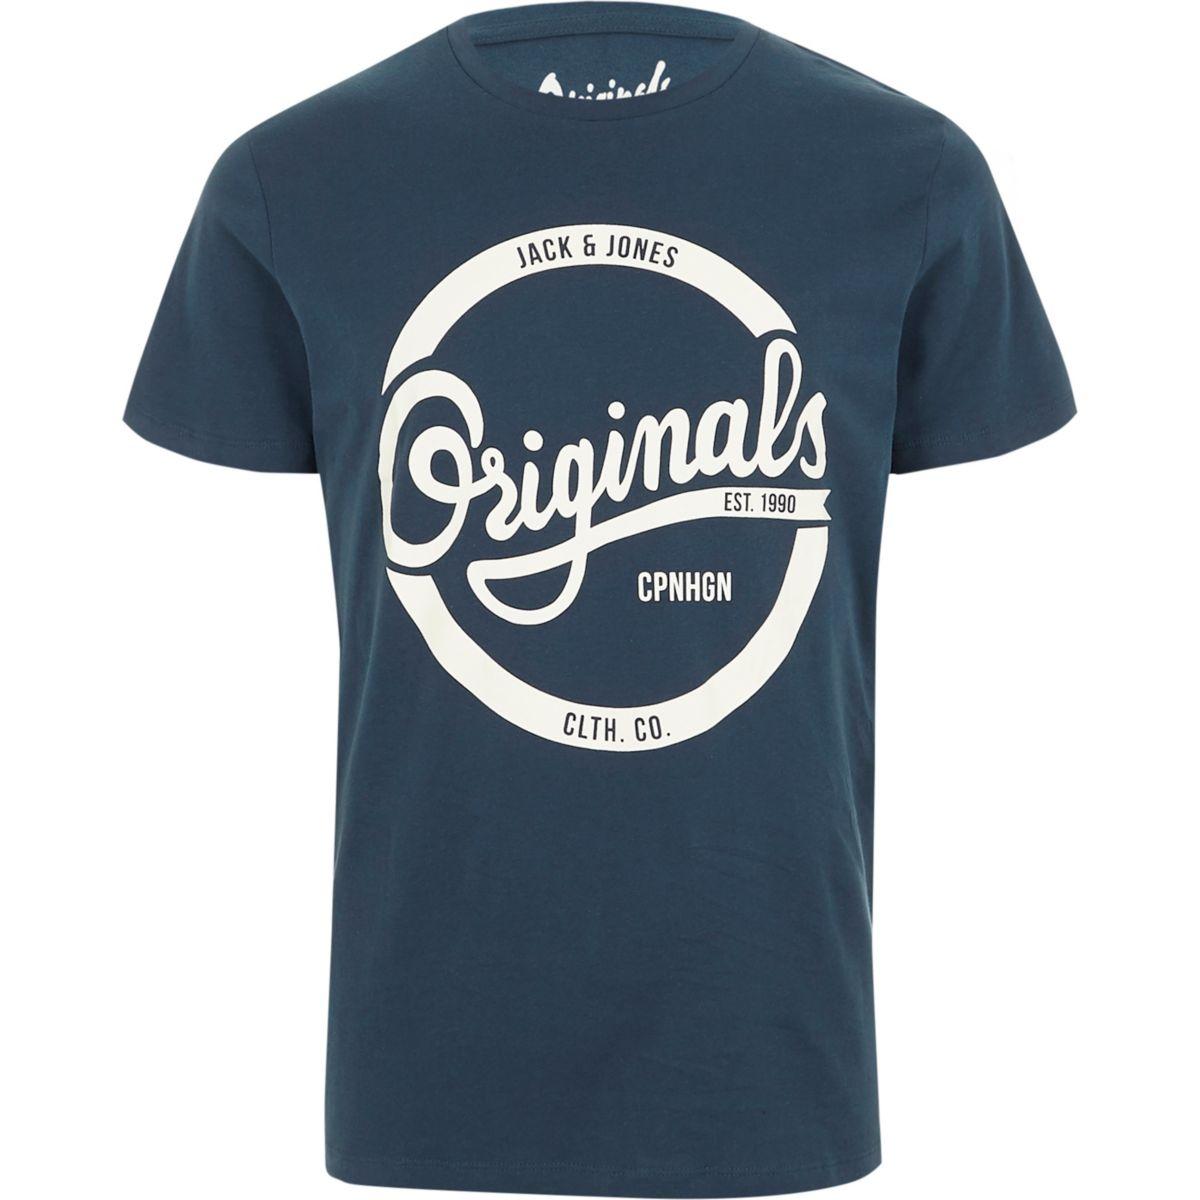 Navy Jack & Jones printed T-shirt